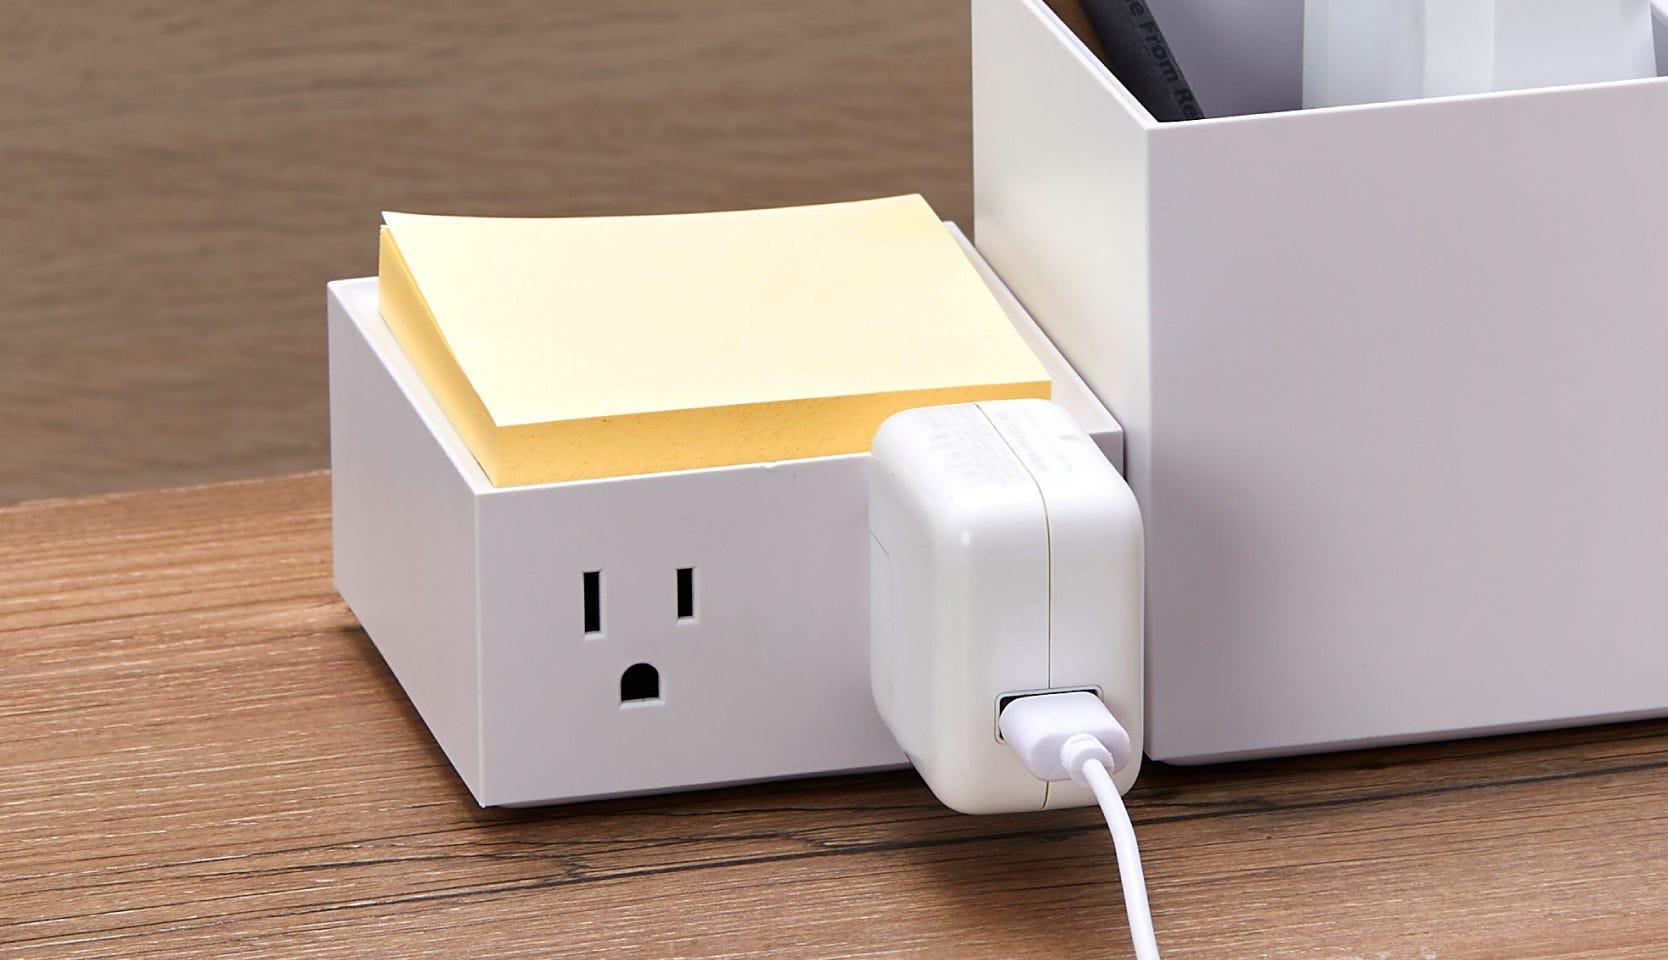 Konnect Desktop Power Hubs